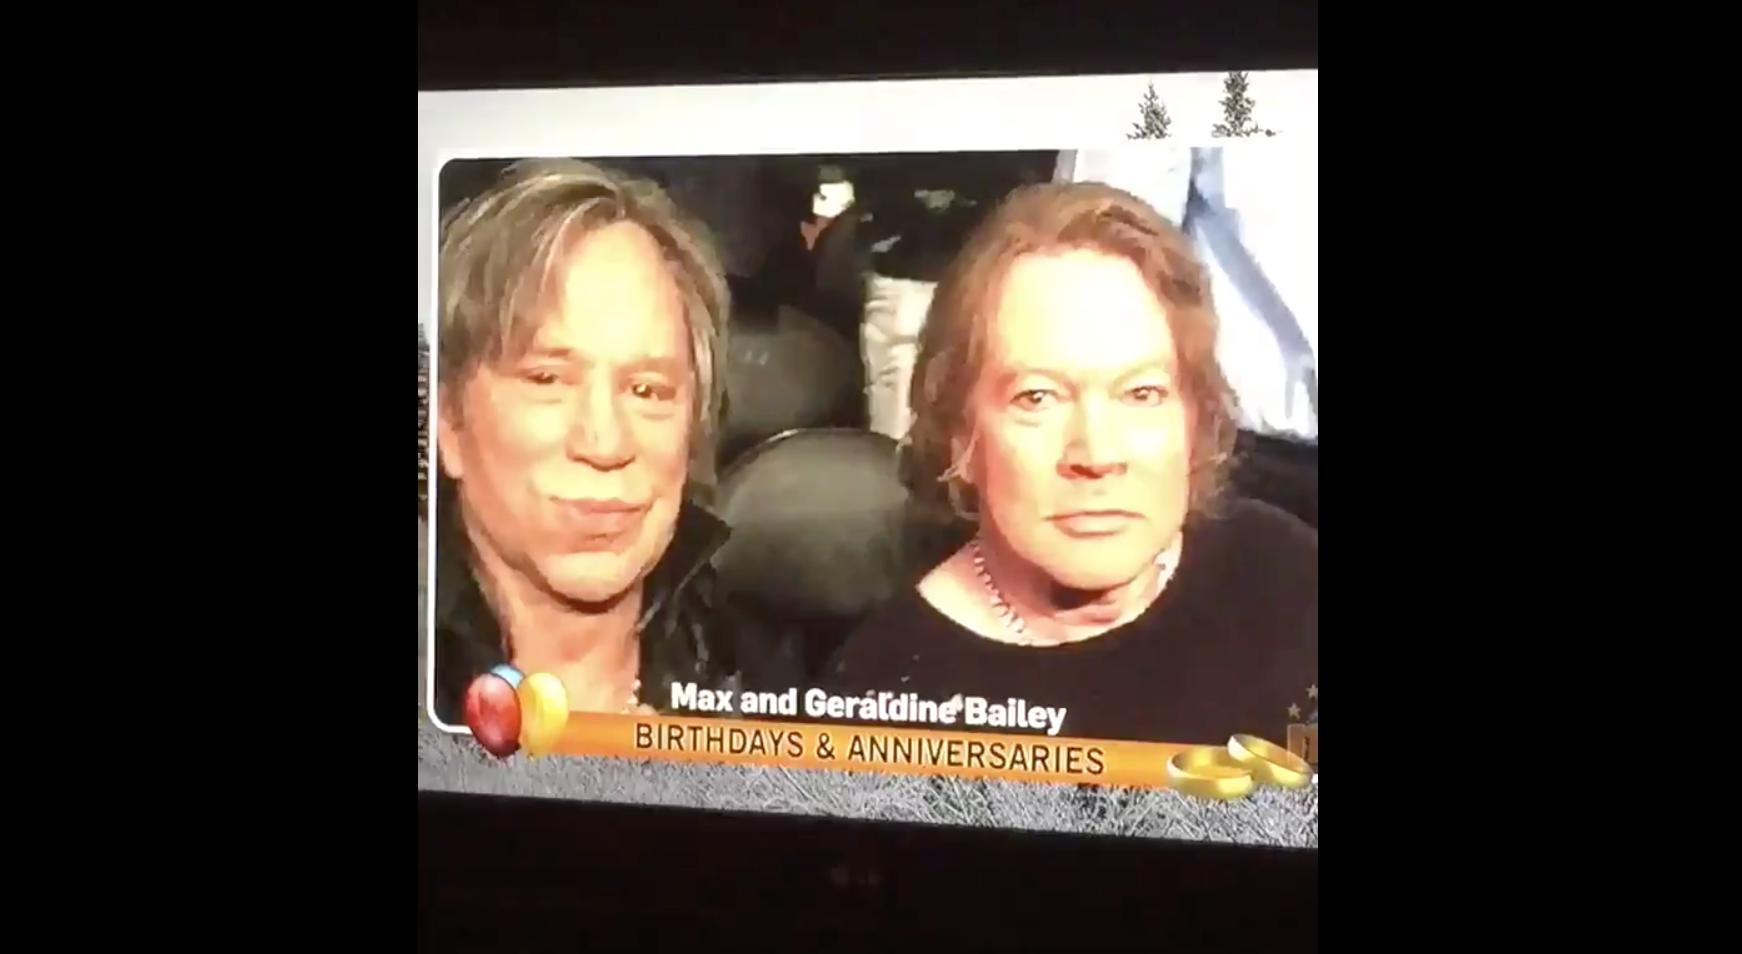 Axl Movie 2018 local news broadcast celebrates axl rose and mickey rourke's